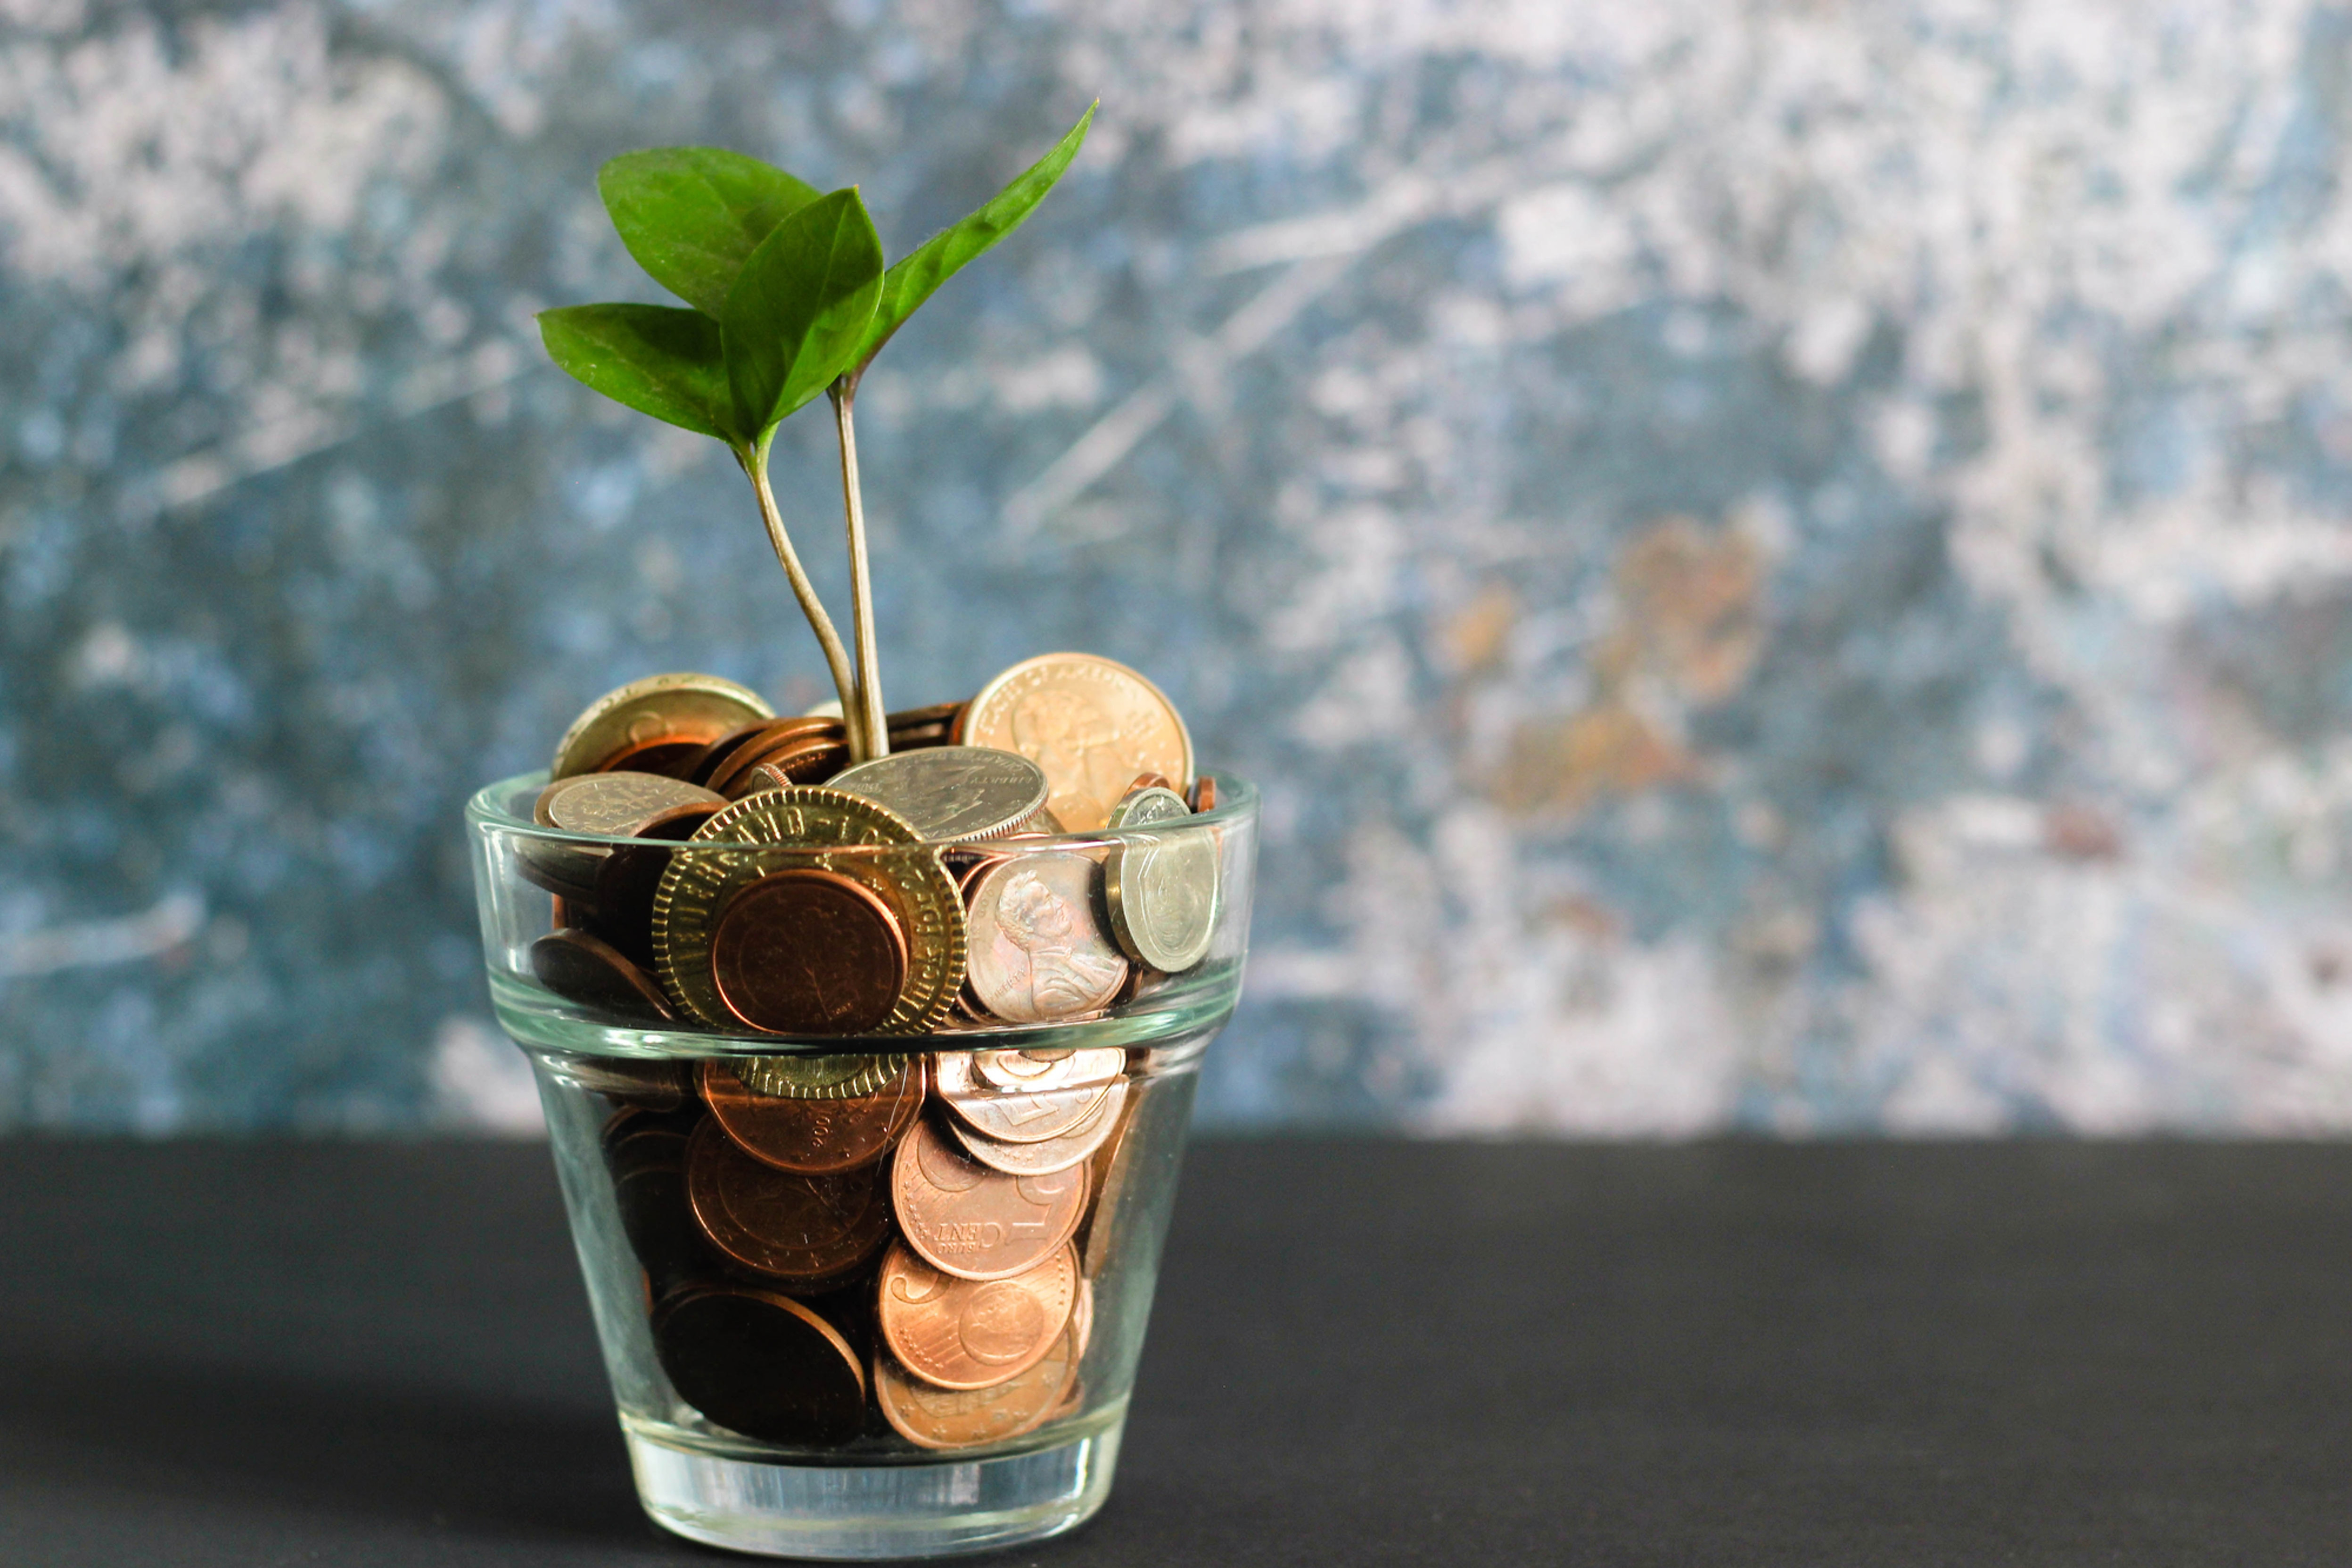 Moneywise - Budget Skills